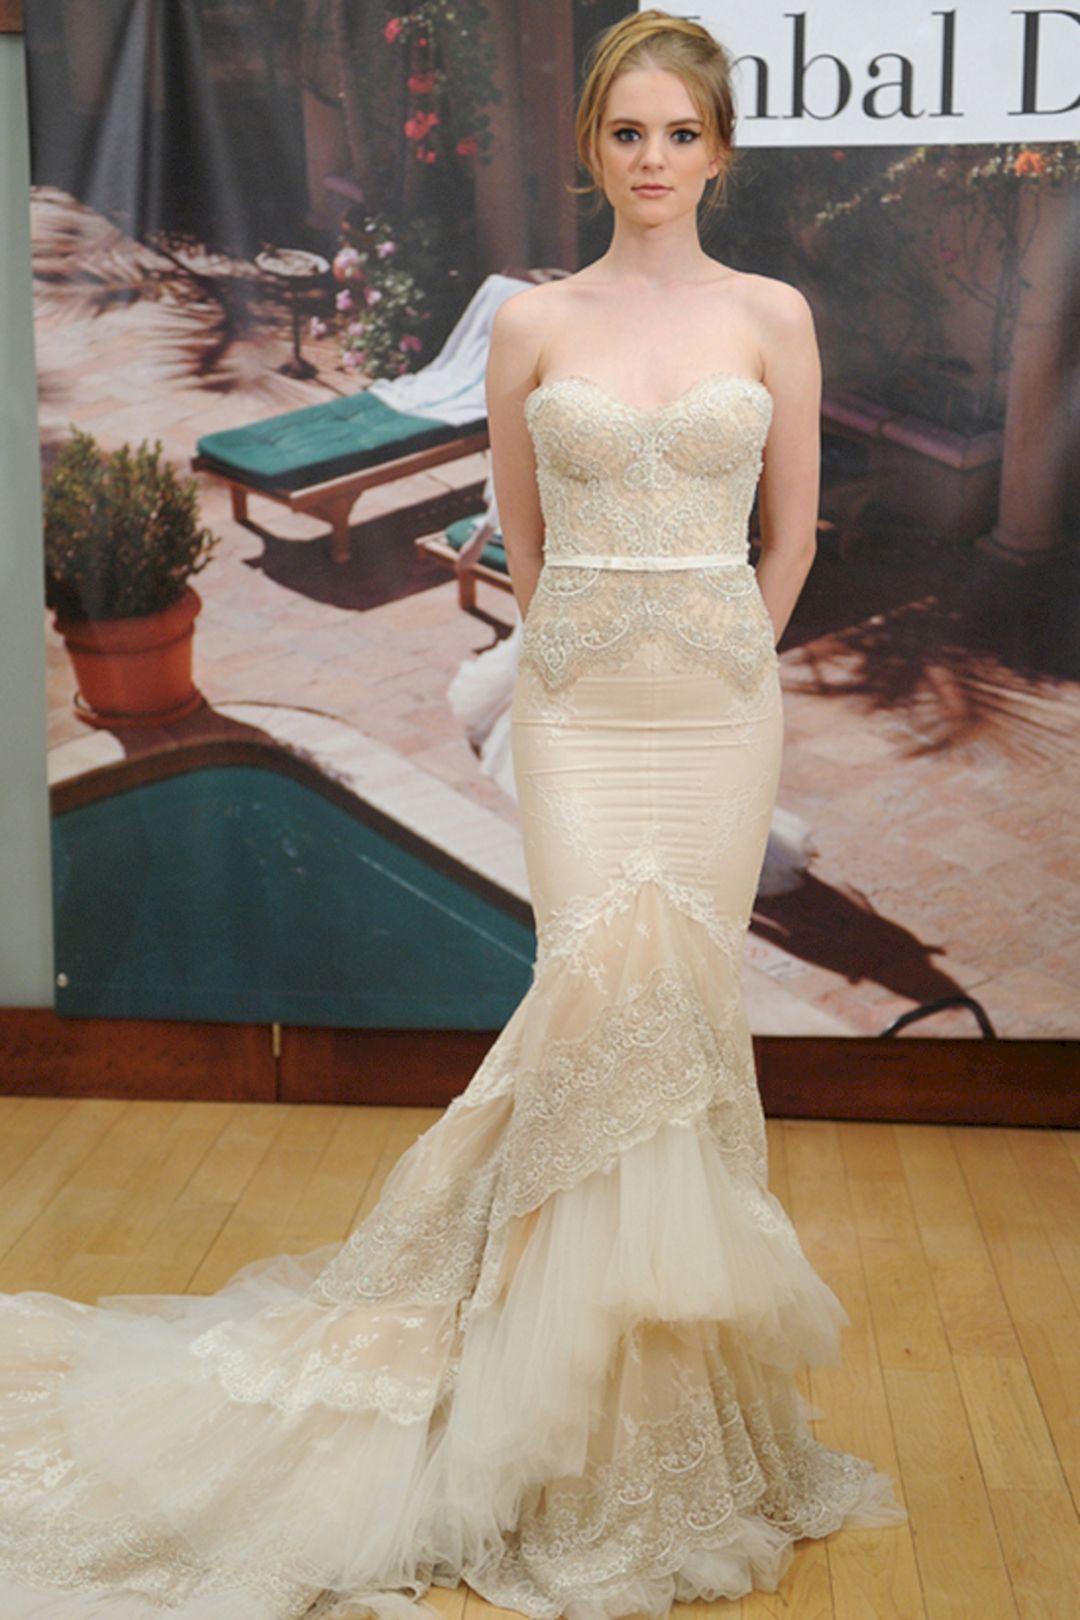 inbal dror wedding gown design for bridal looks more pretty